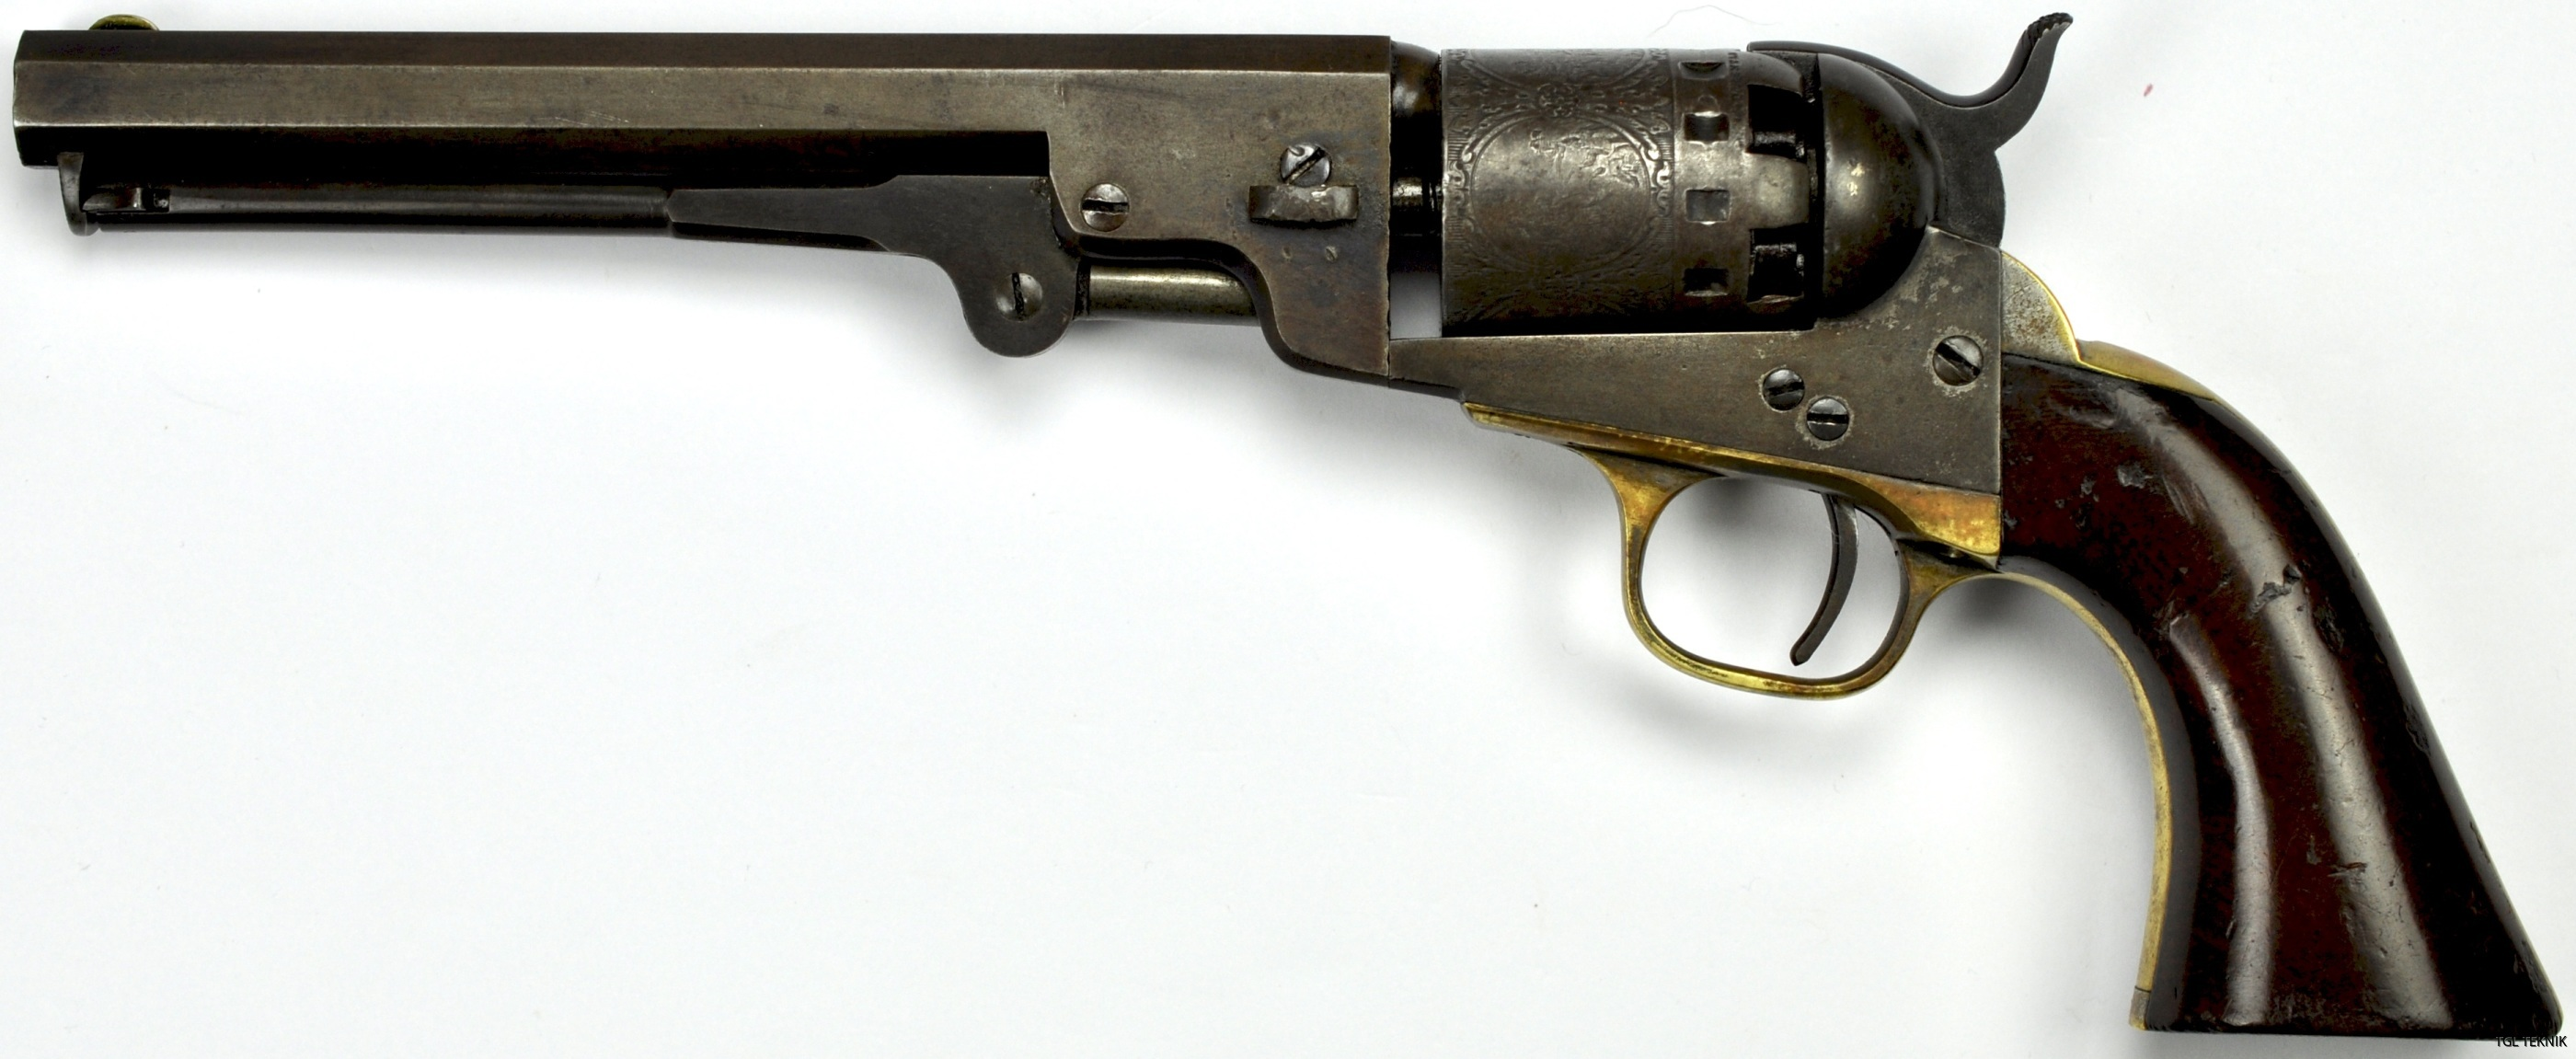 fullsizeoutput_1902